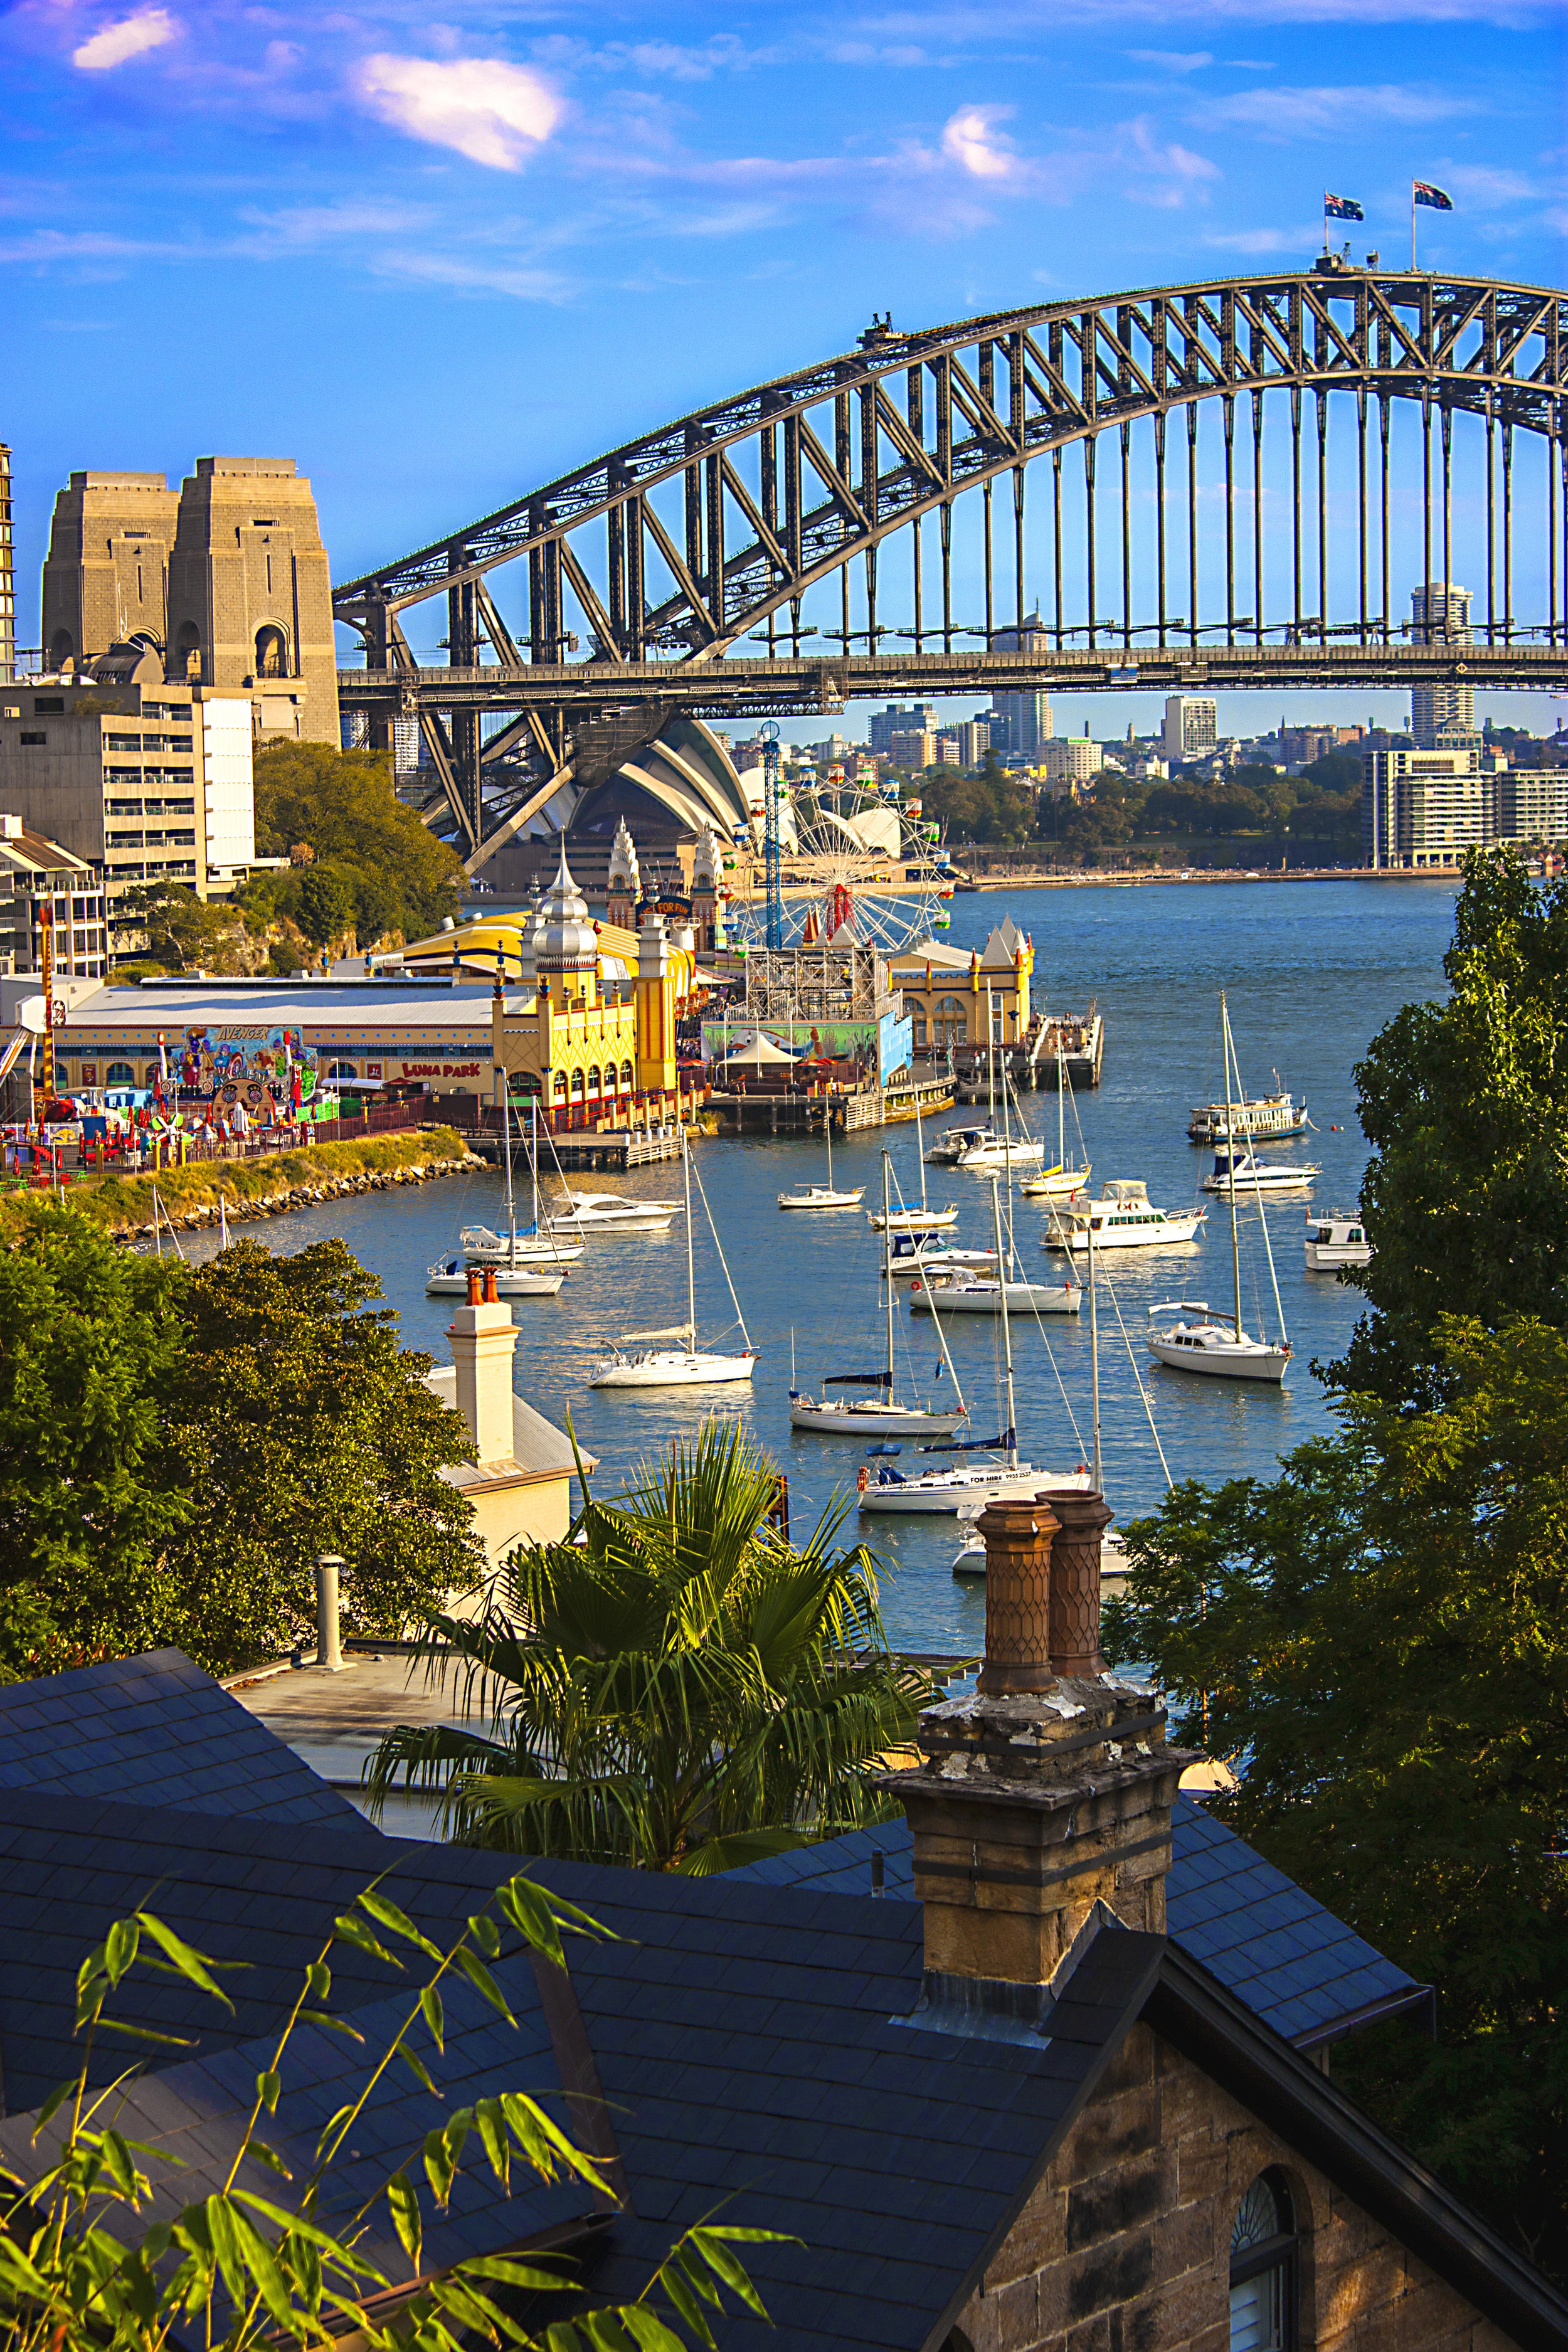 Australia_Sydney_Luna Park.jpg